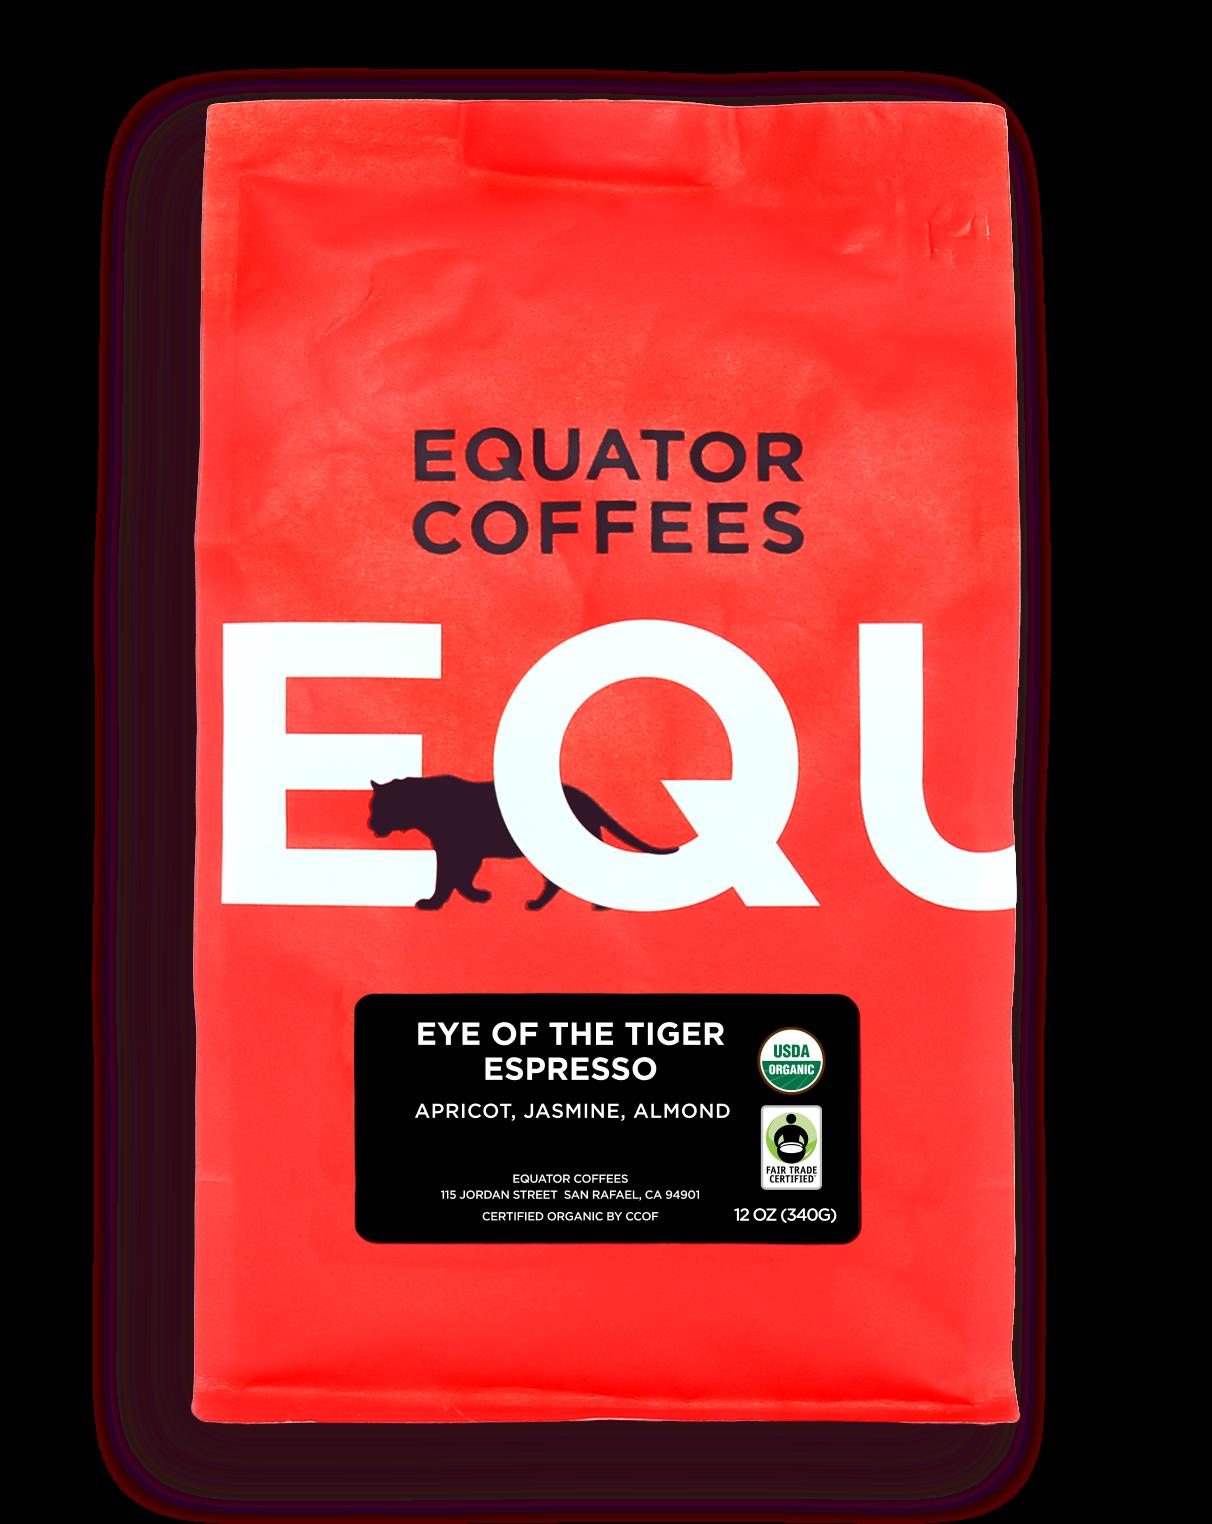 Eye of the Tiger Espresso Fair Trade Organic